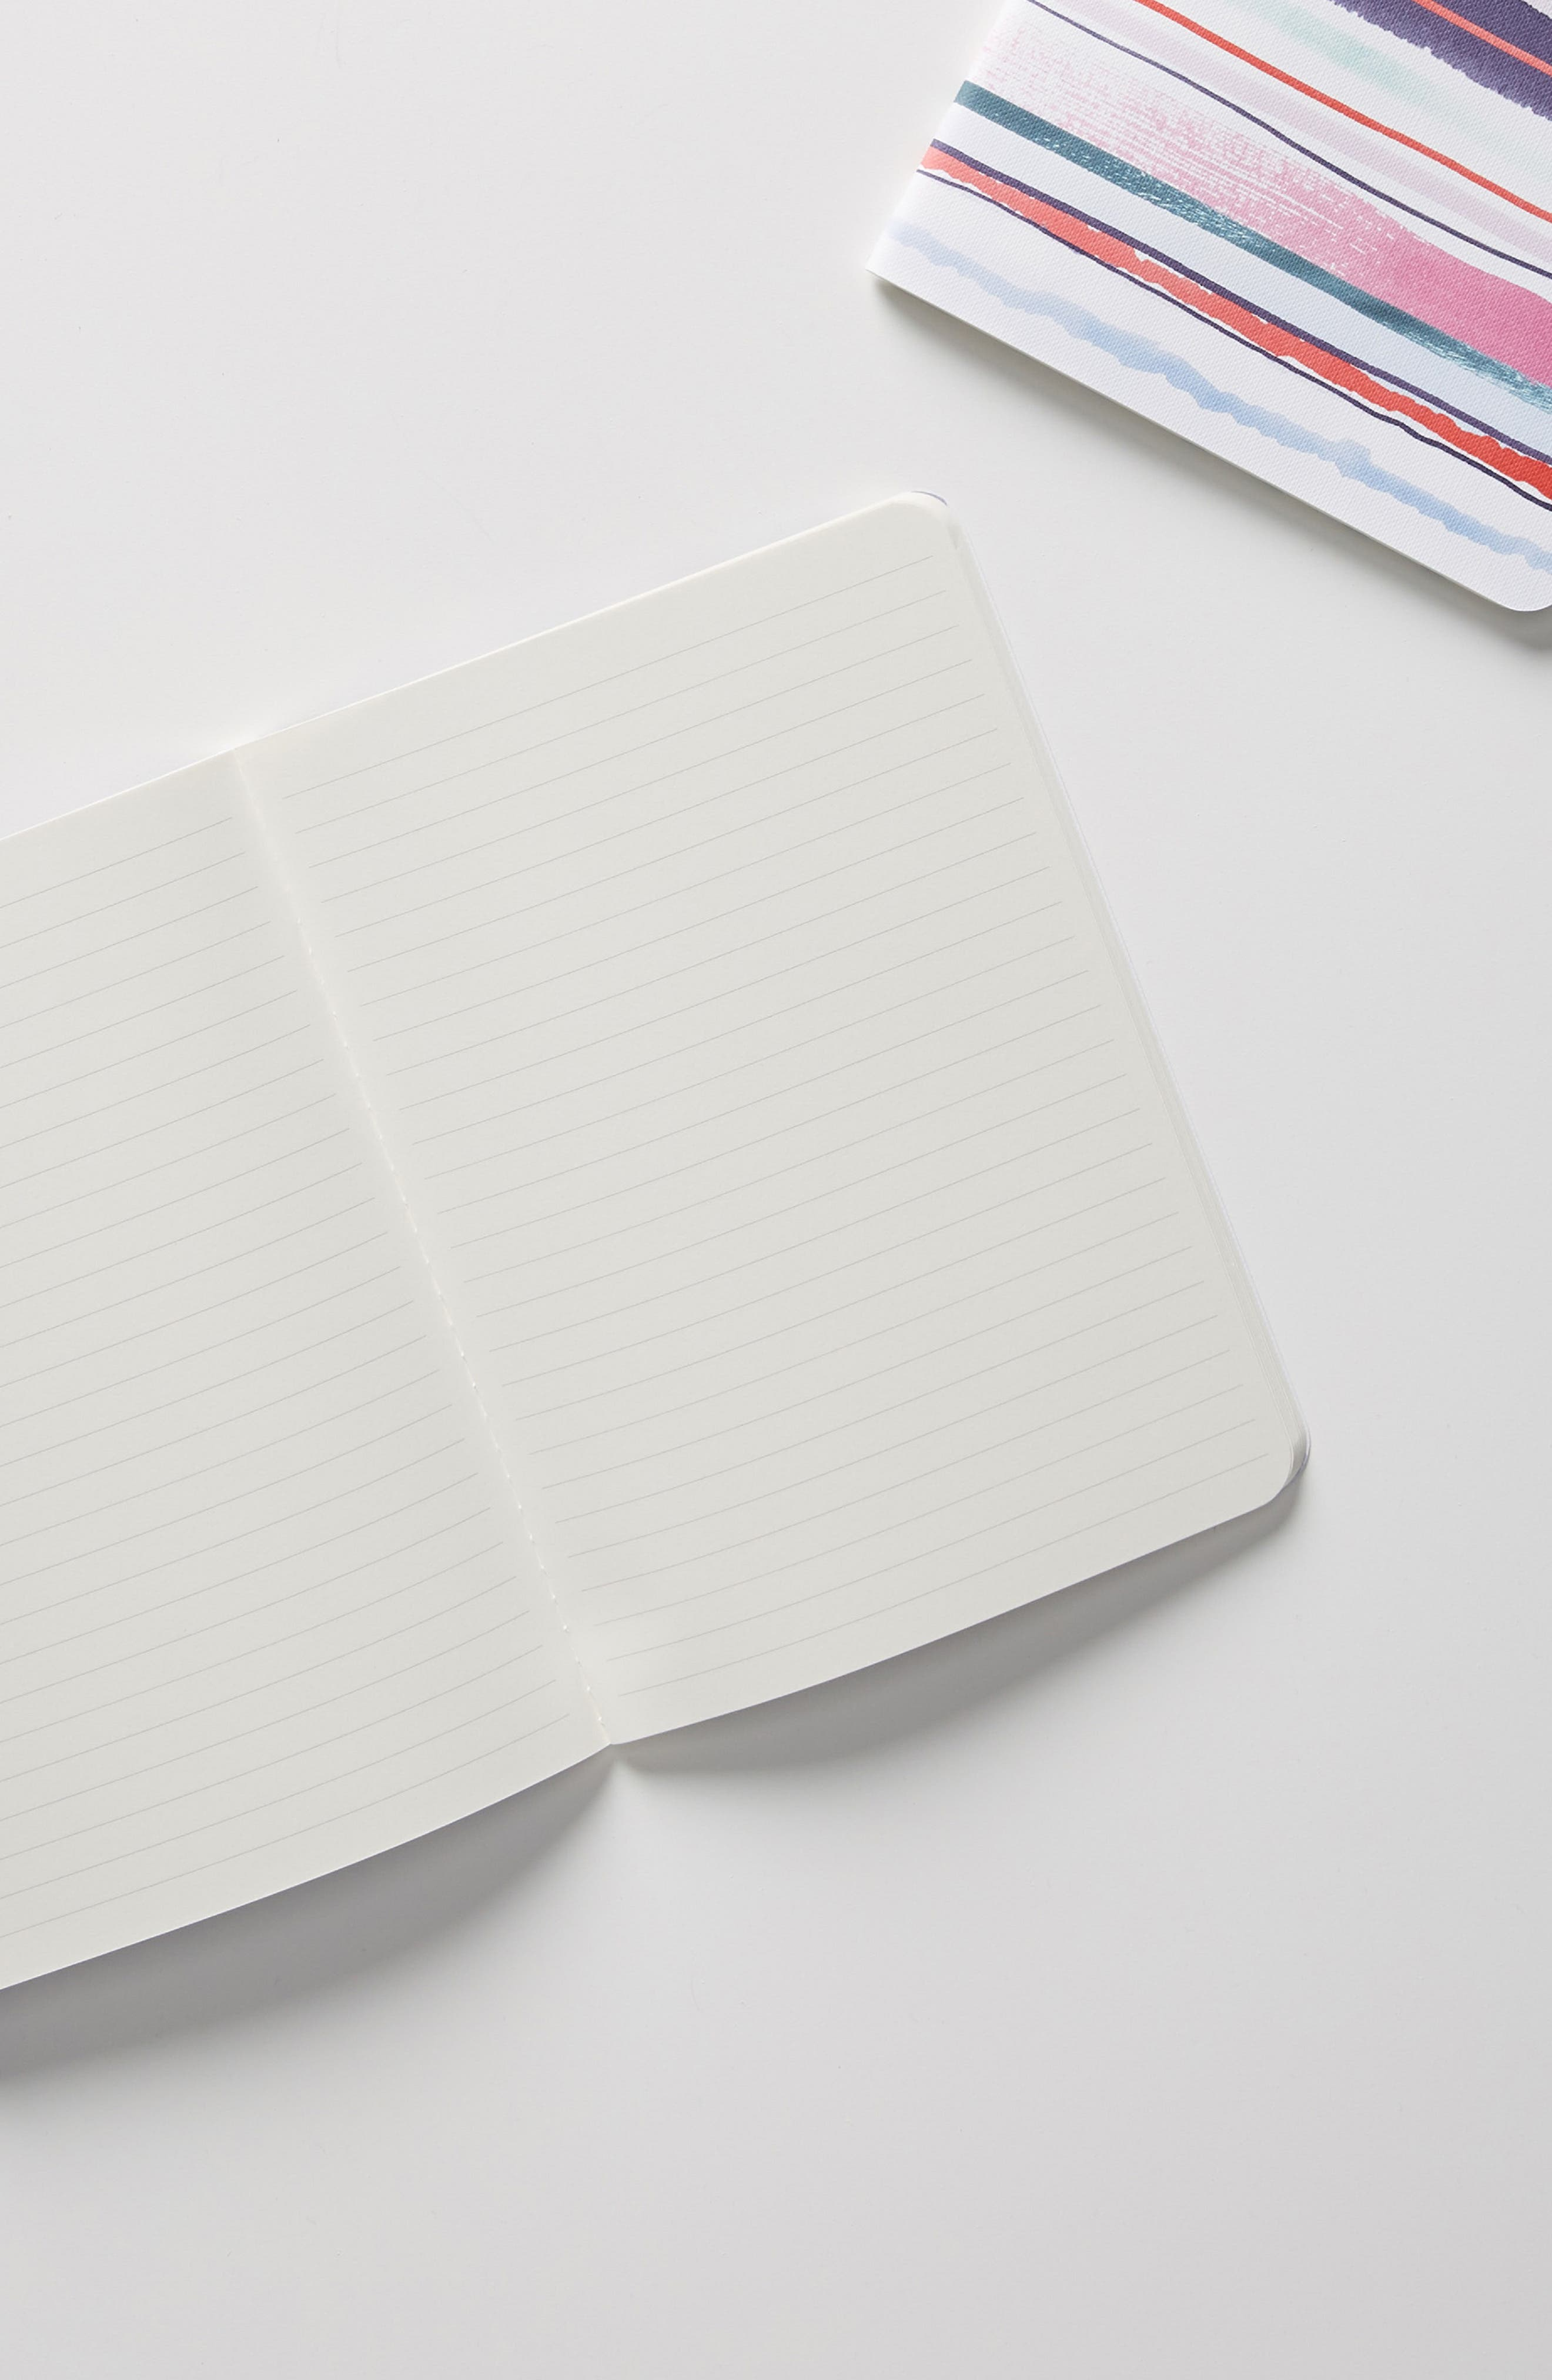 Pippa Set of 3 Journals,                             Alternate thumbnail 2, color,                             MULTI